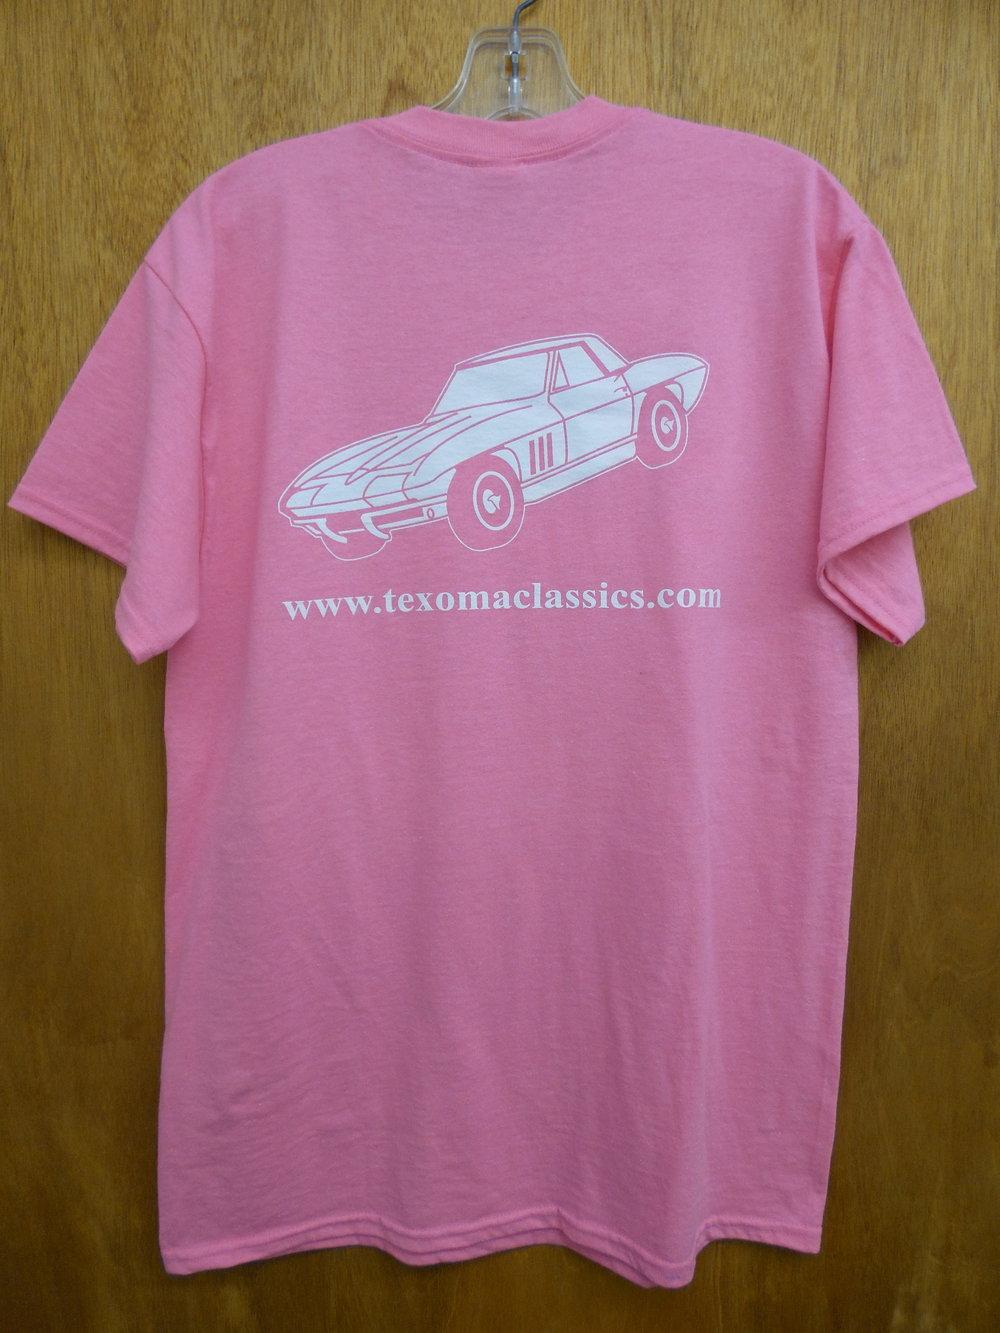 Texoma Classics T-Shirts